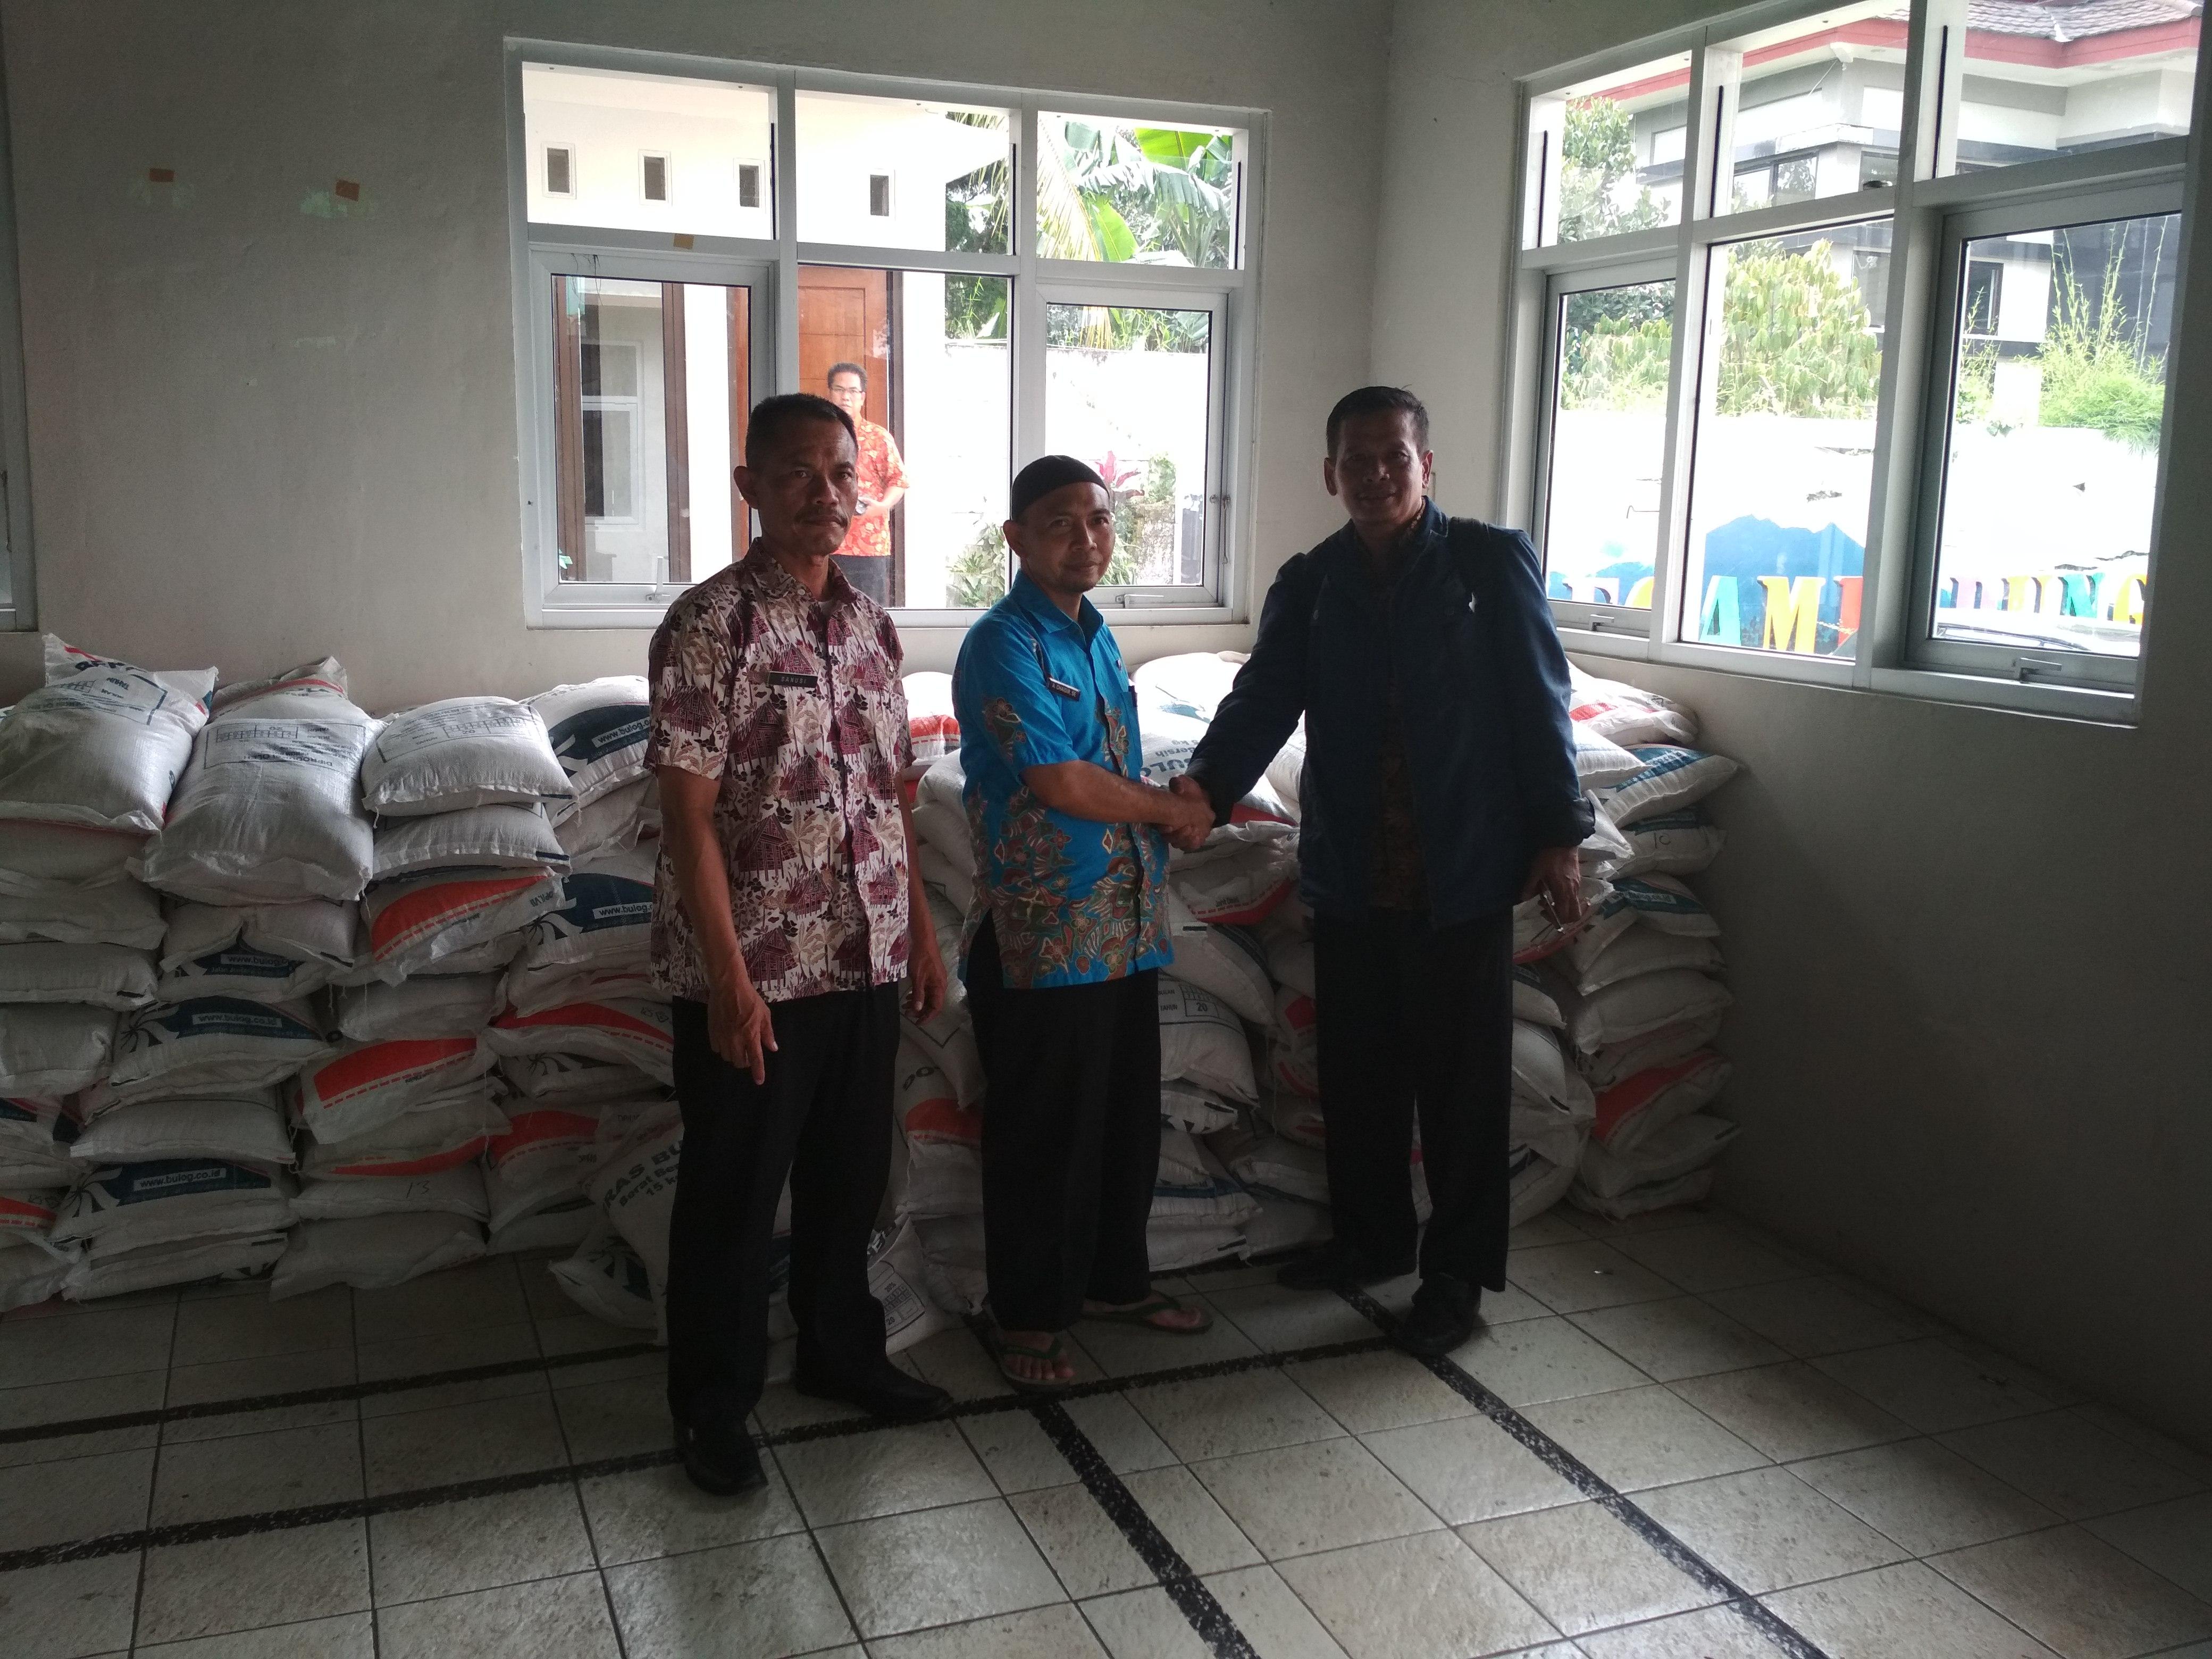 Penyerahan Bantuan CPPD untuk Korban Bencana Alam Kecamatan Megamendung Kab.Bogor pada Maret 2018